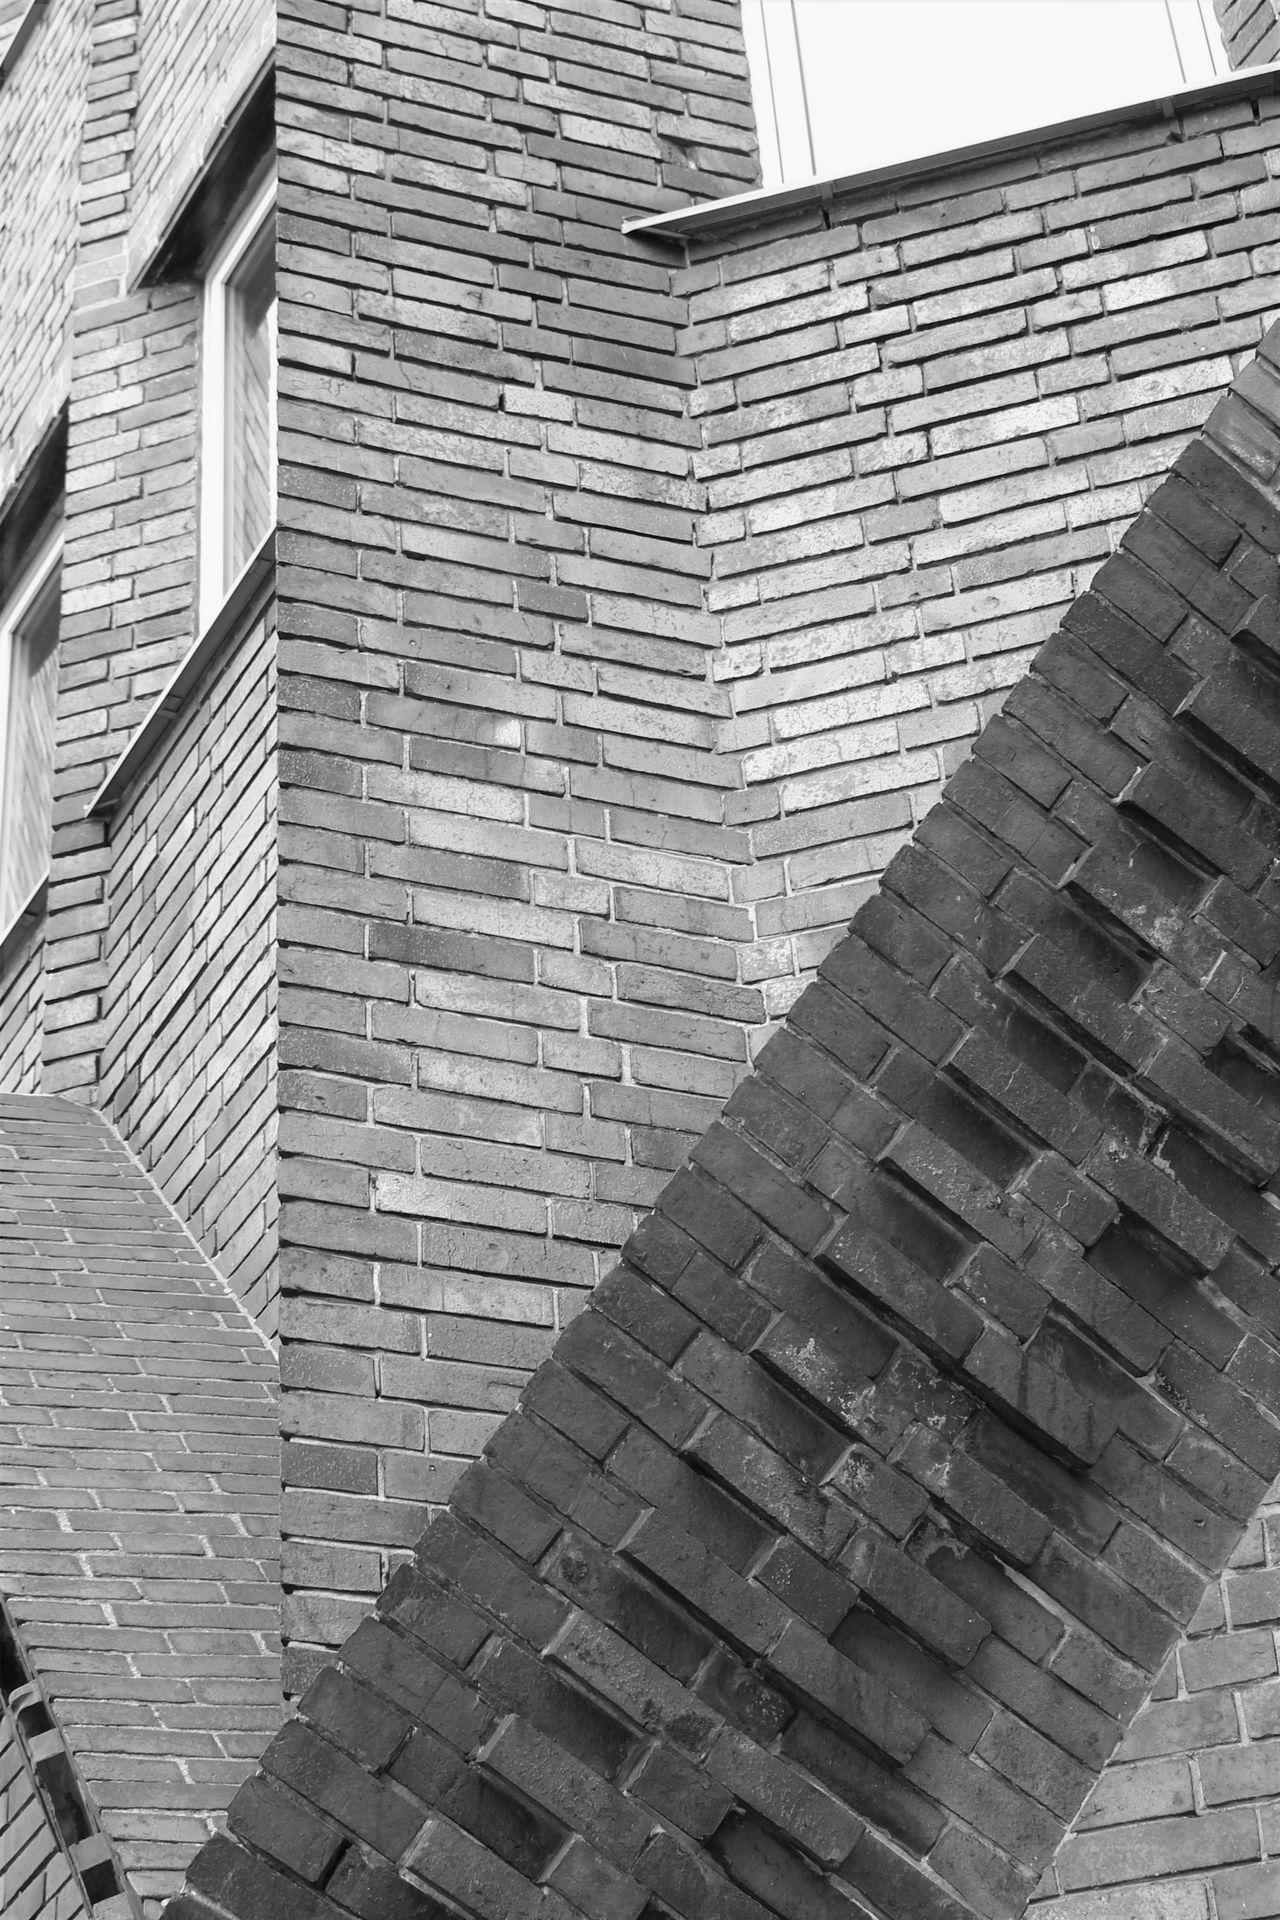 Backgrounds Building Close Up Geometry Historical Building Pattern Steinernde Stadt Structure Urban Urban Lifestyle Wall Ziegelsteine